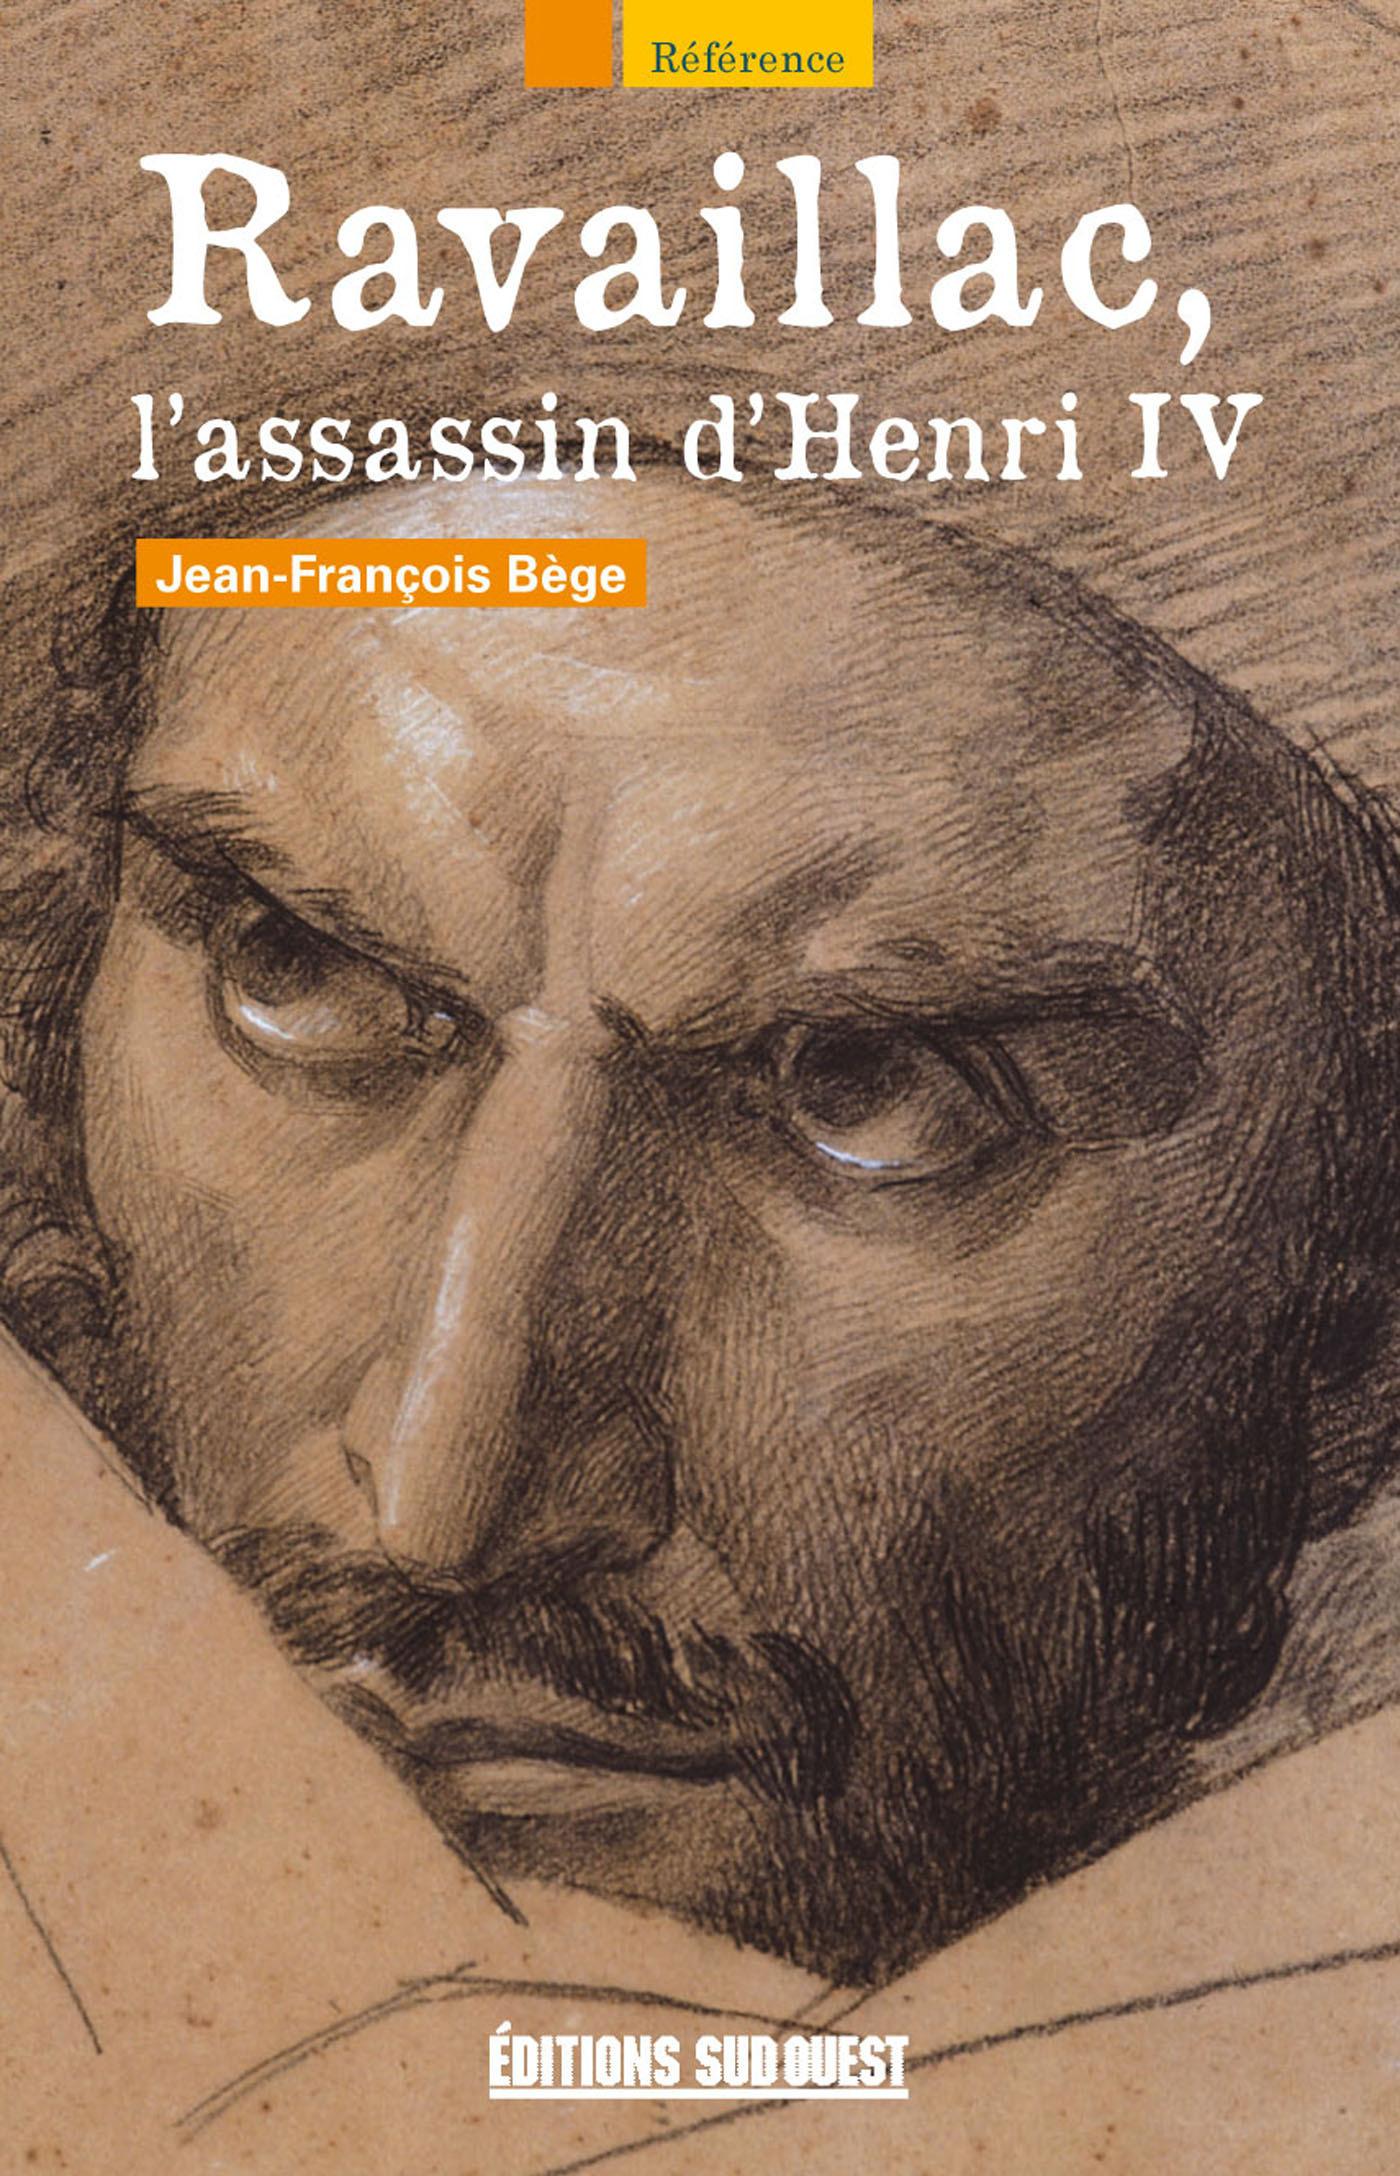 Ravaillac, l'assassin d'Henri IV  - Jean-François Bège